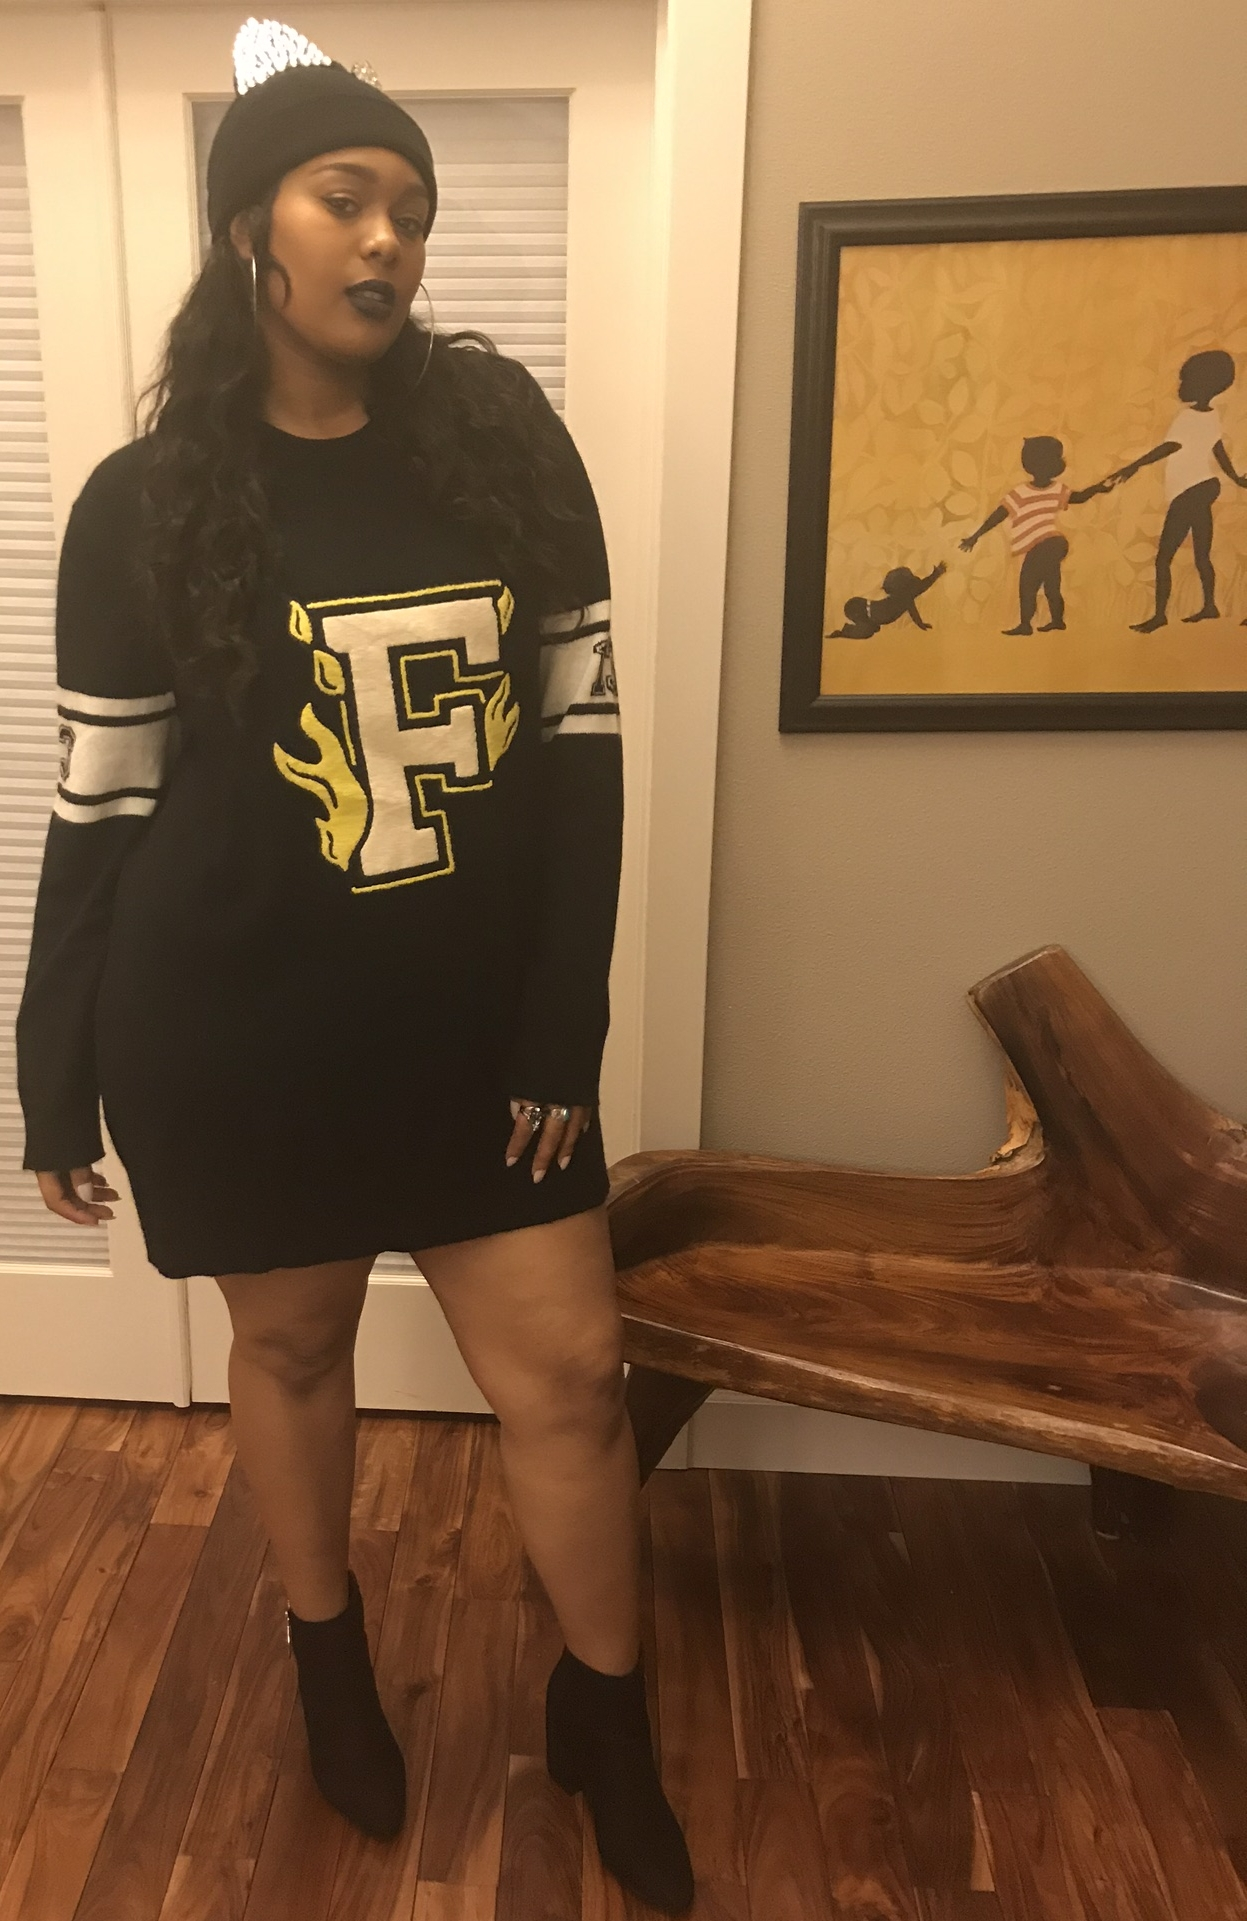 FENTY PUMA by Rihanna Longline Varsitysweater Fenty - Worn on its own or with legging or jeans - Love it!